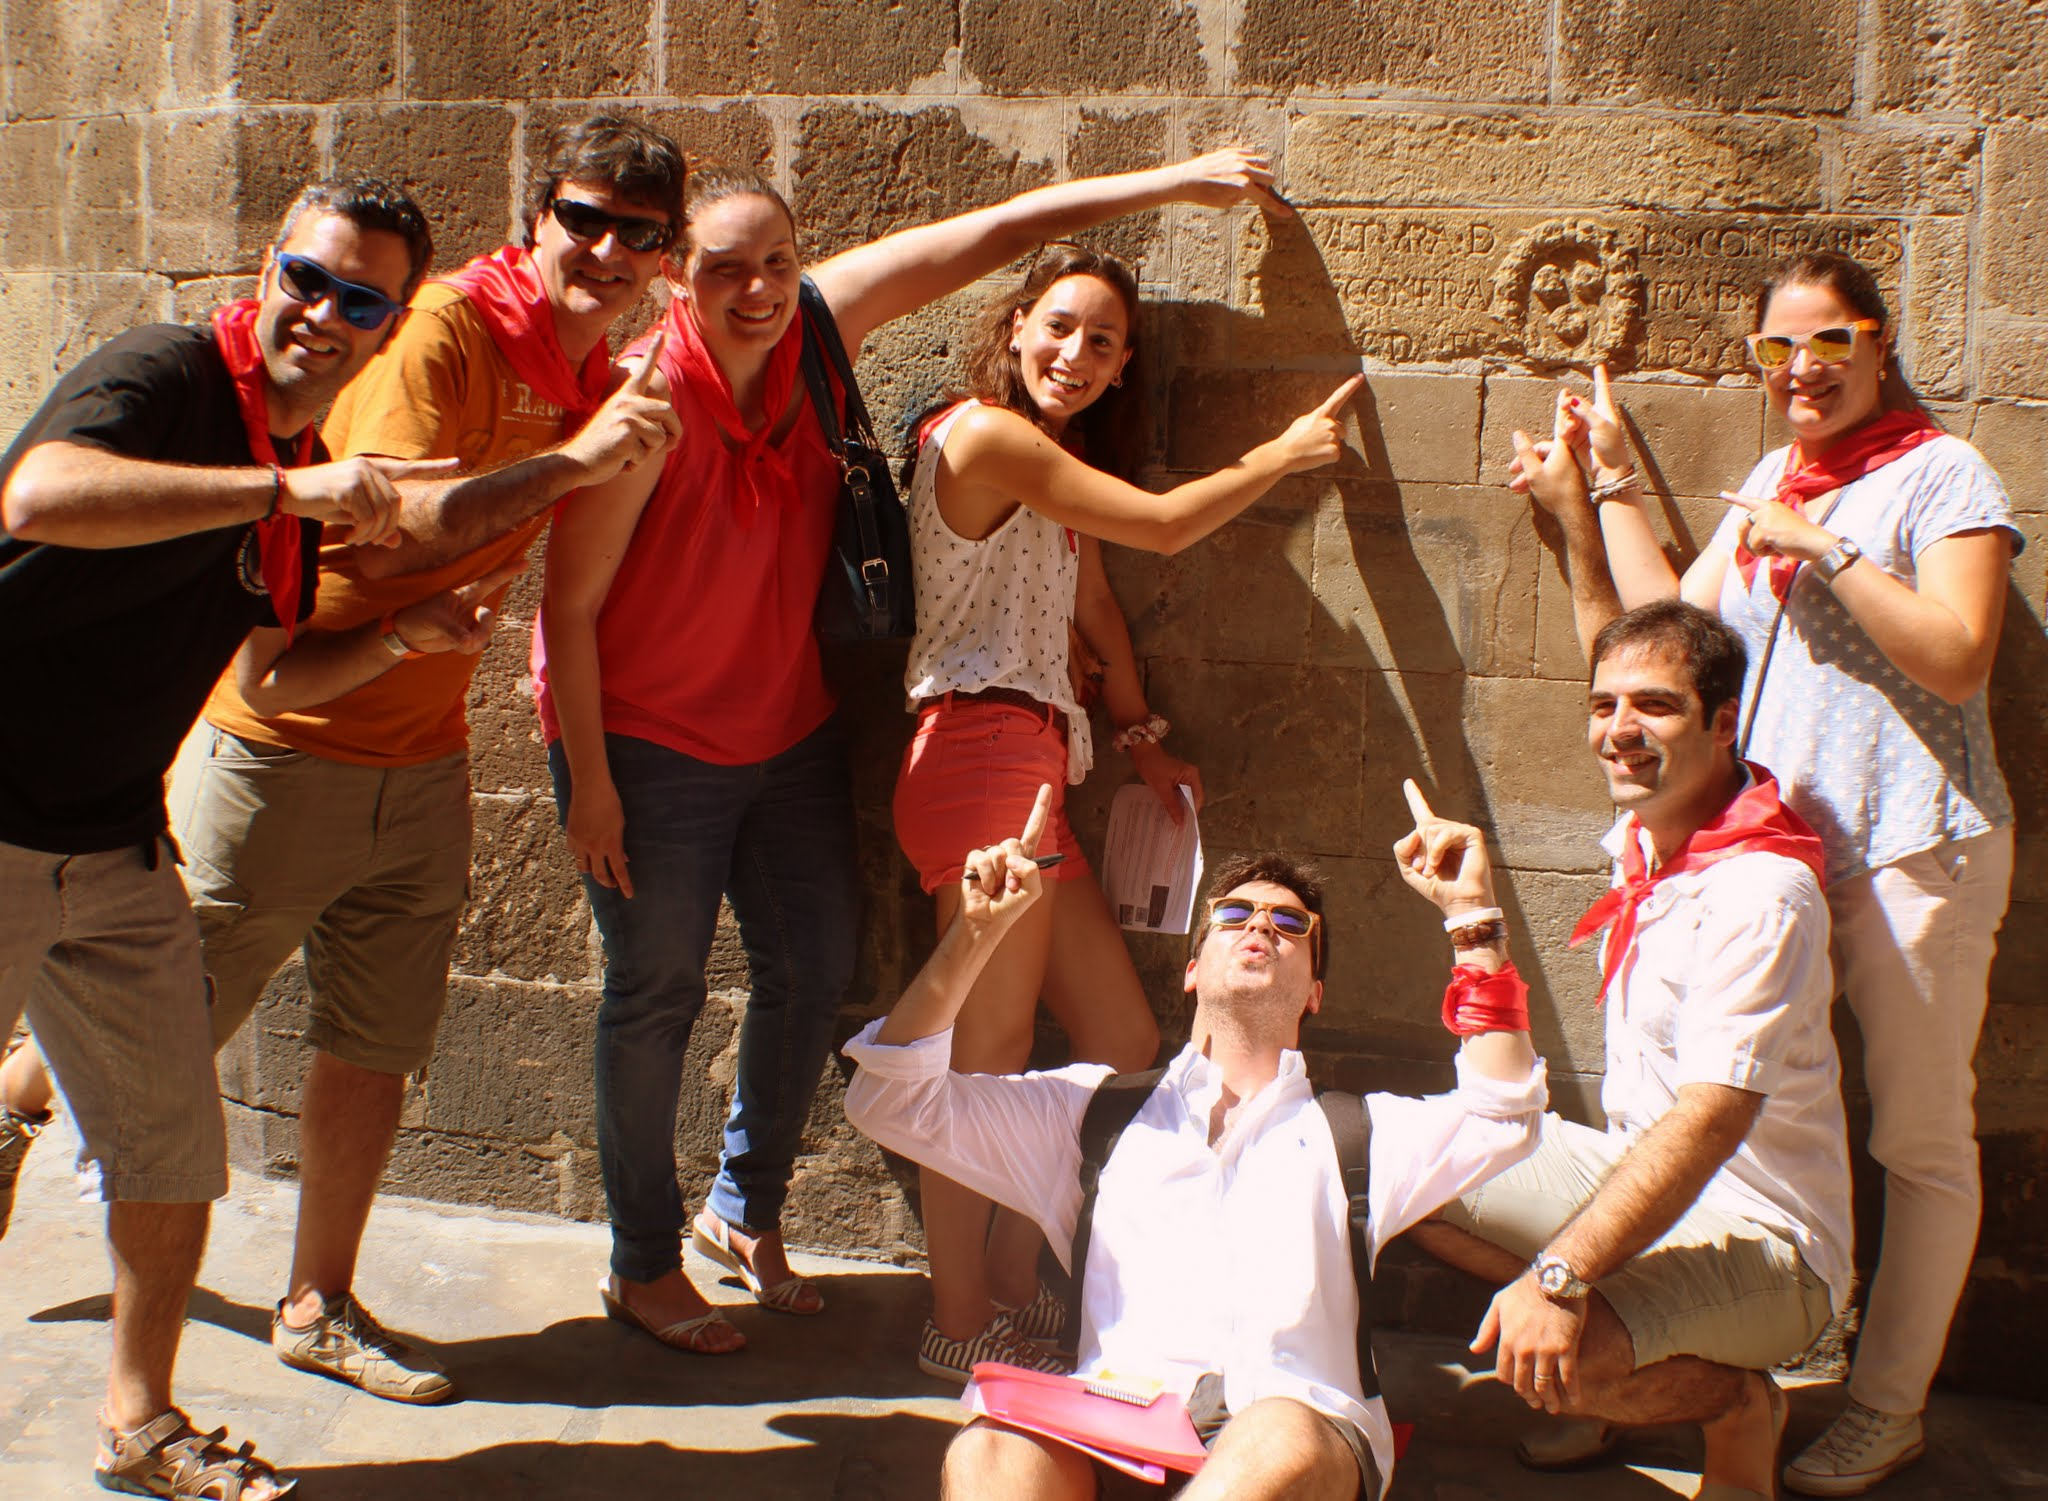 Barcelona scavenger hunt